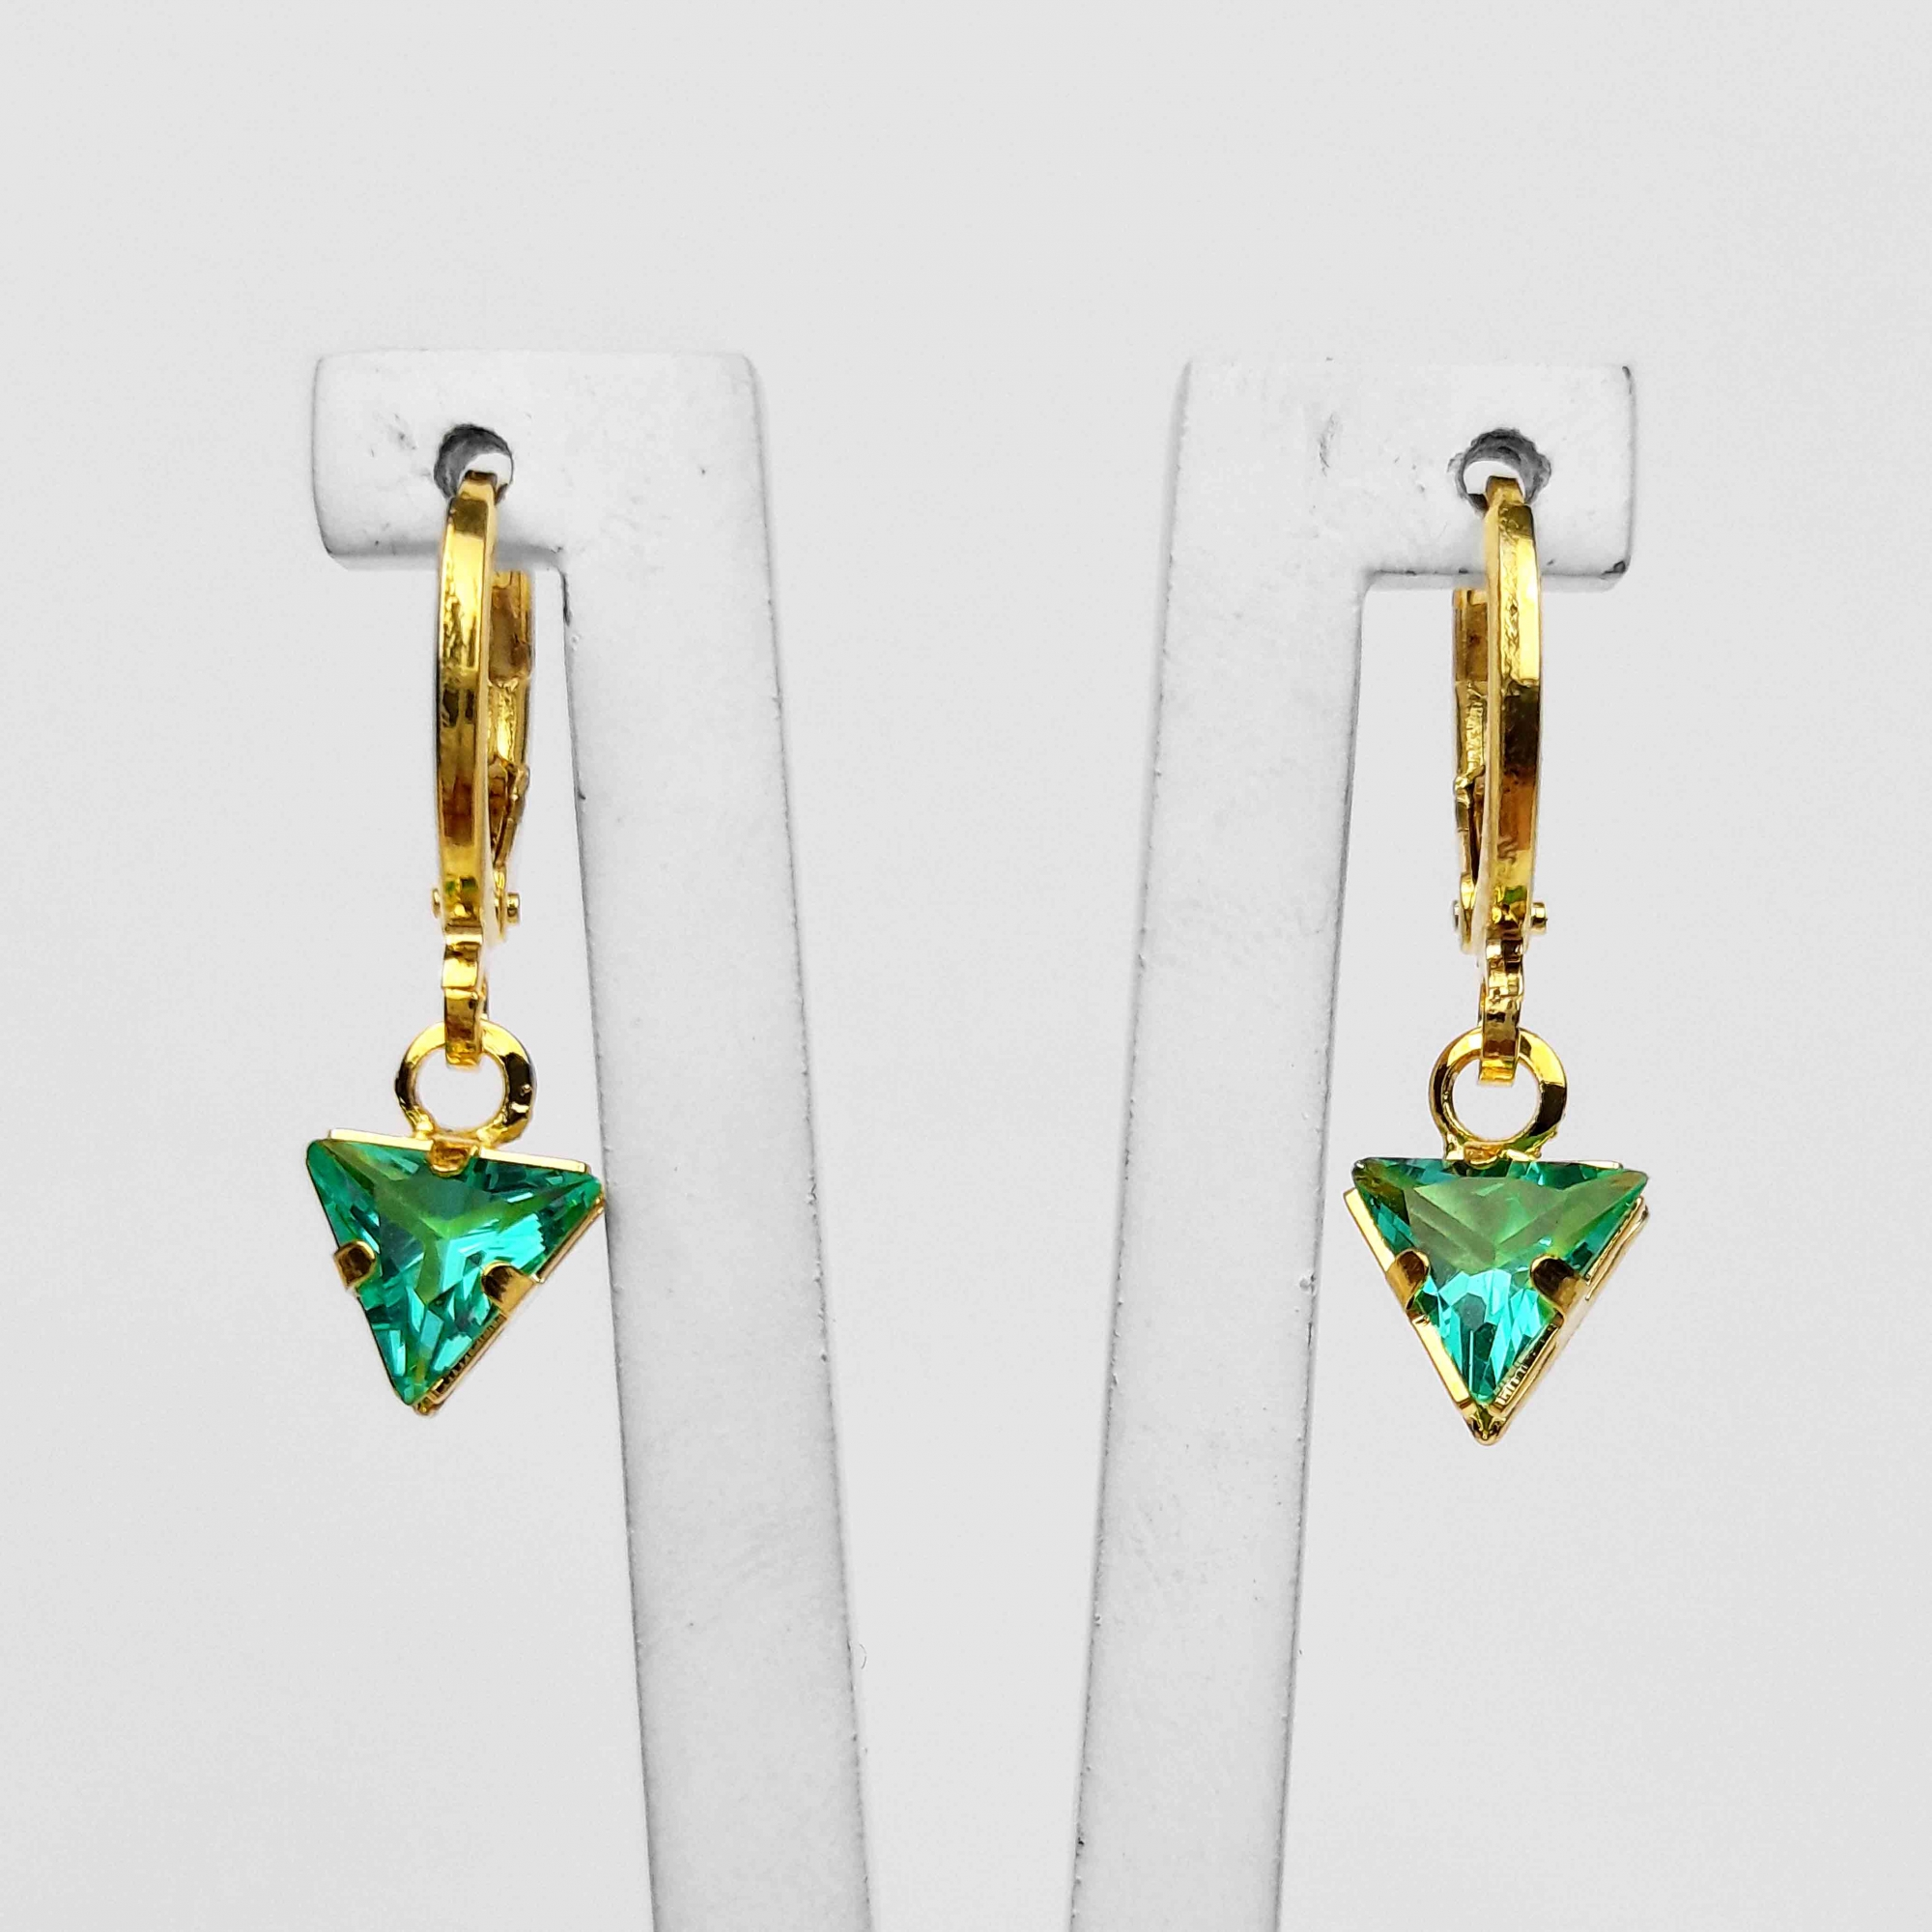 Brinco Argola Triângulo Zircônia Colorido Folheado Ouro 18K  - Lunozê Joias